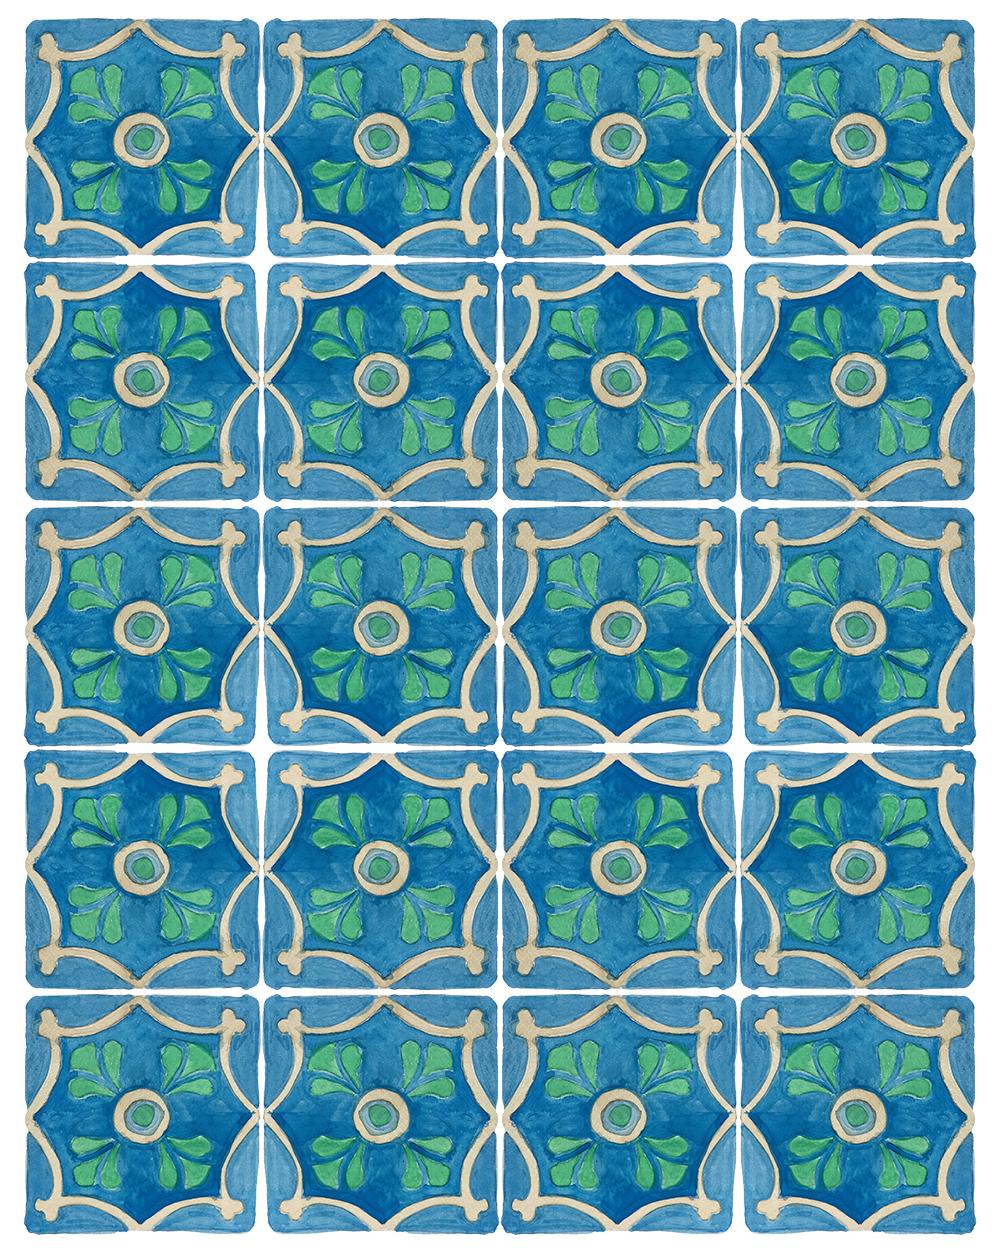 mexica-watercolor-tiles-pattern-03.jpg